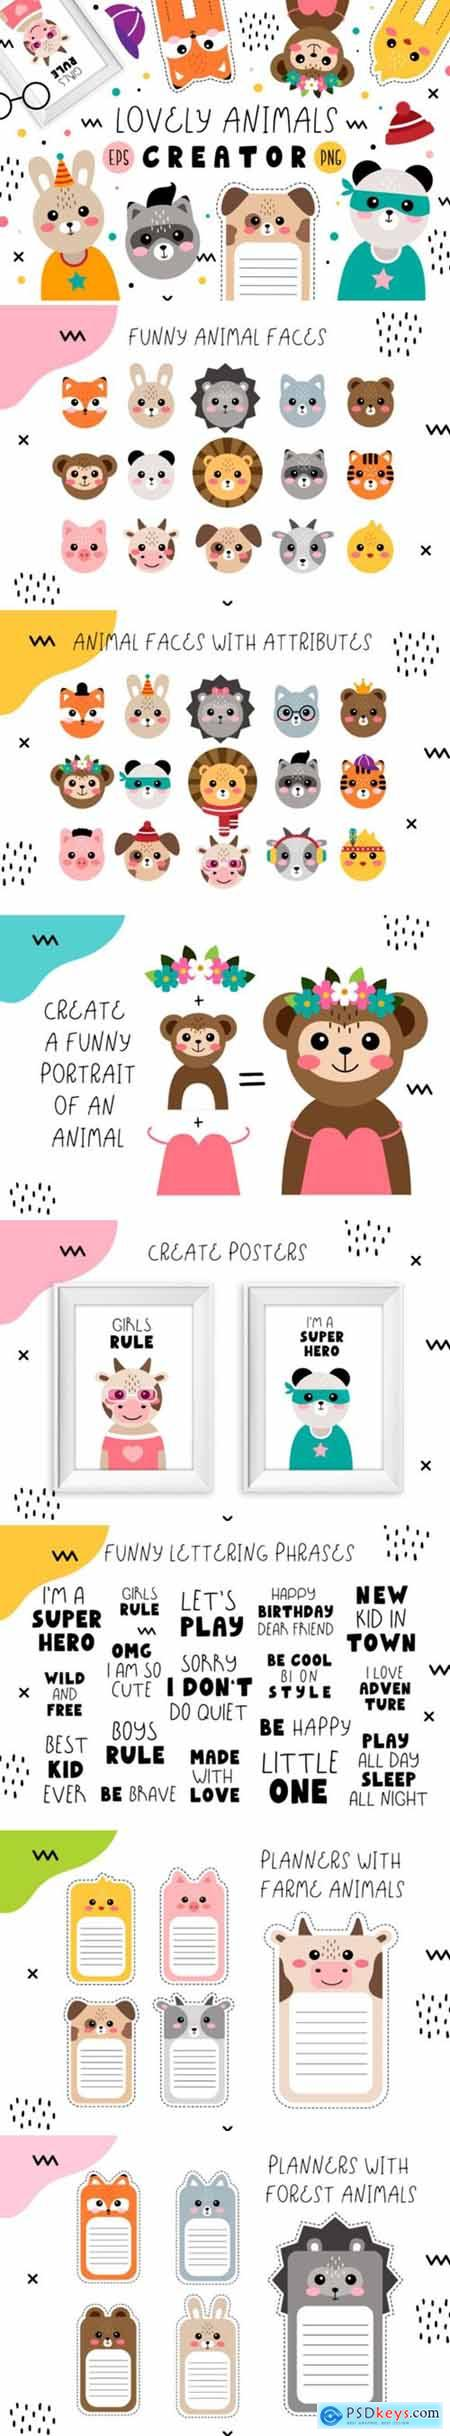 Lovely Animals Creator 3008374